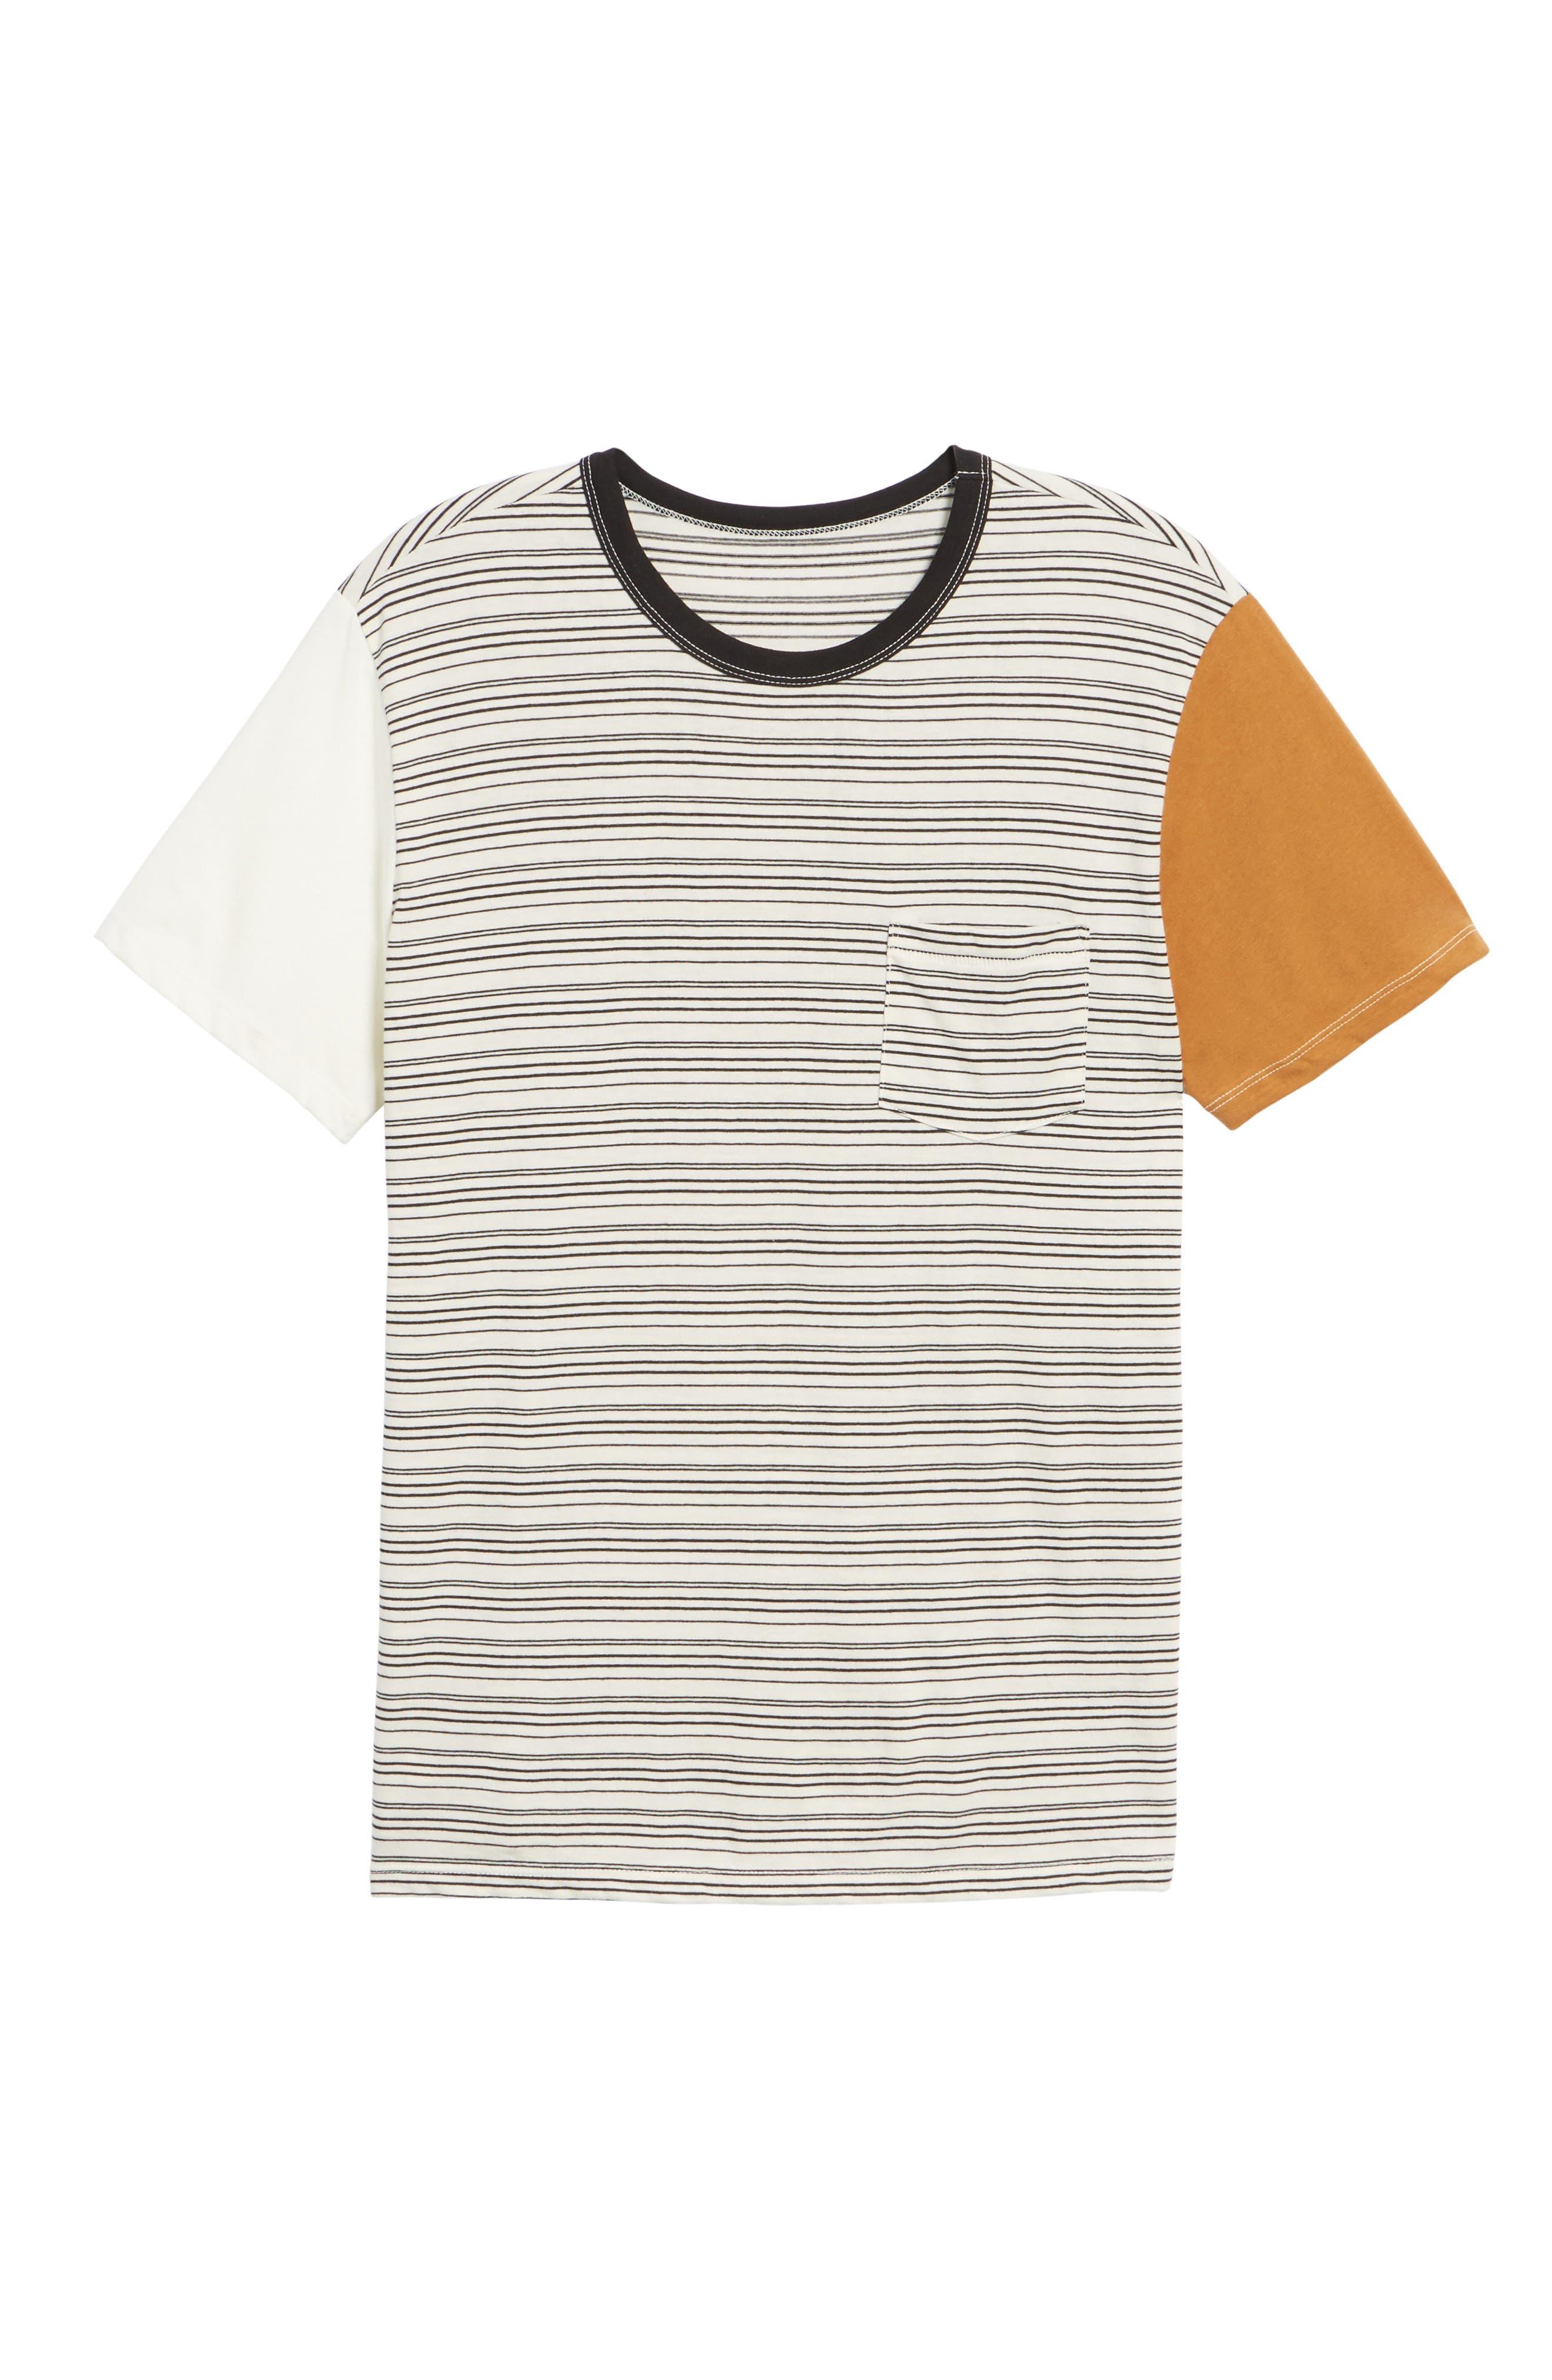 Blocked Ringer T-Shirt,                             Alternate thumbnail 6, color,                             Ivory Black Block Stripe